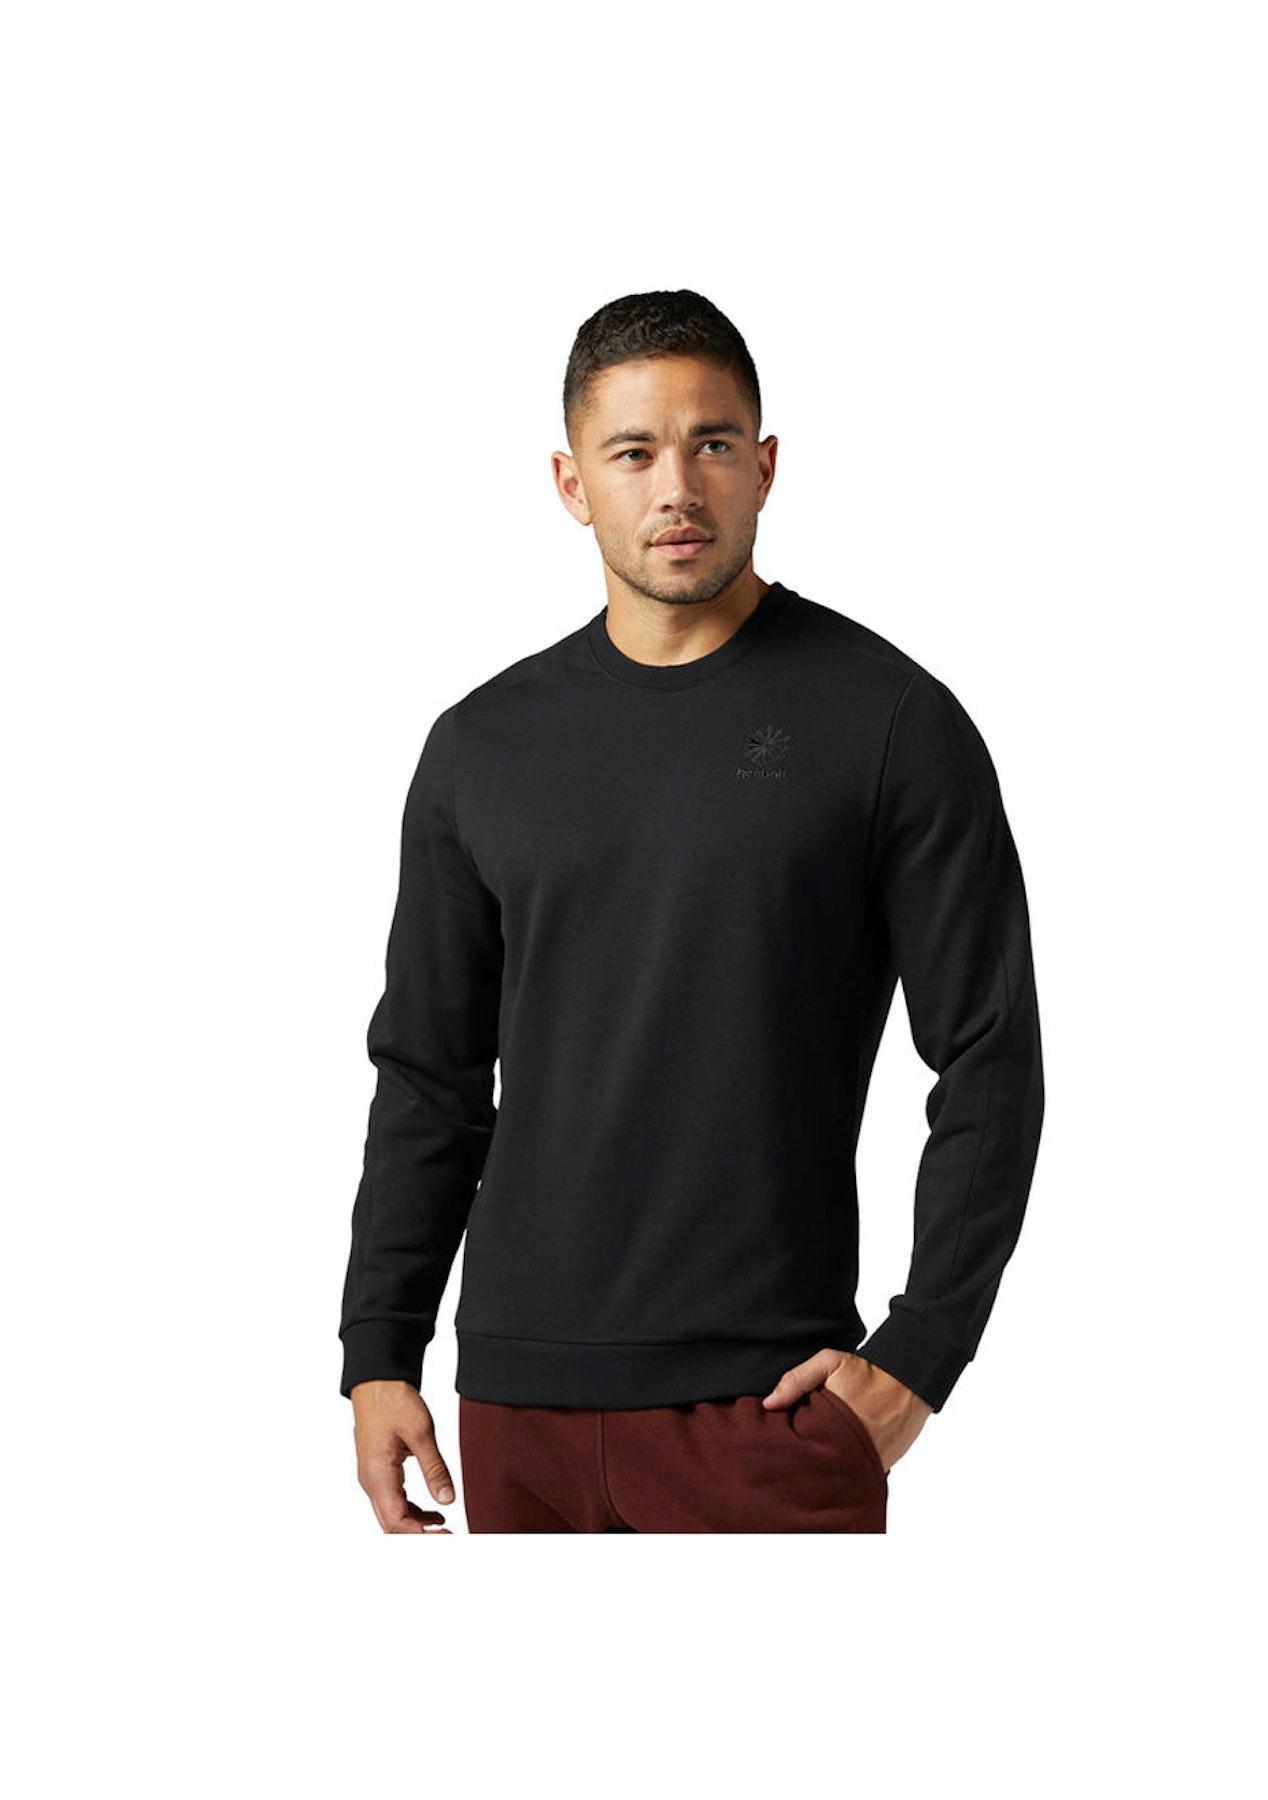 7e05e44175a Reebok Mens - Reebok Classics Franchise French Terry Crewneck Sweatshirt -  Black - Reebok Last Ones - Onceit